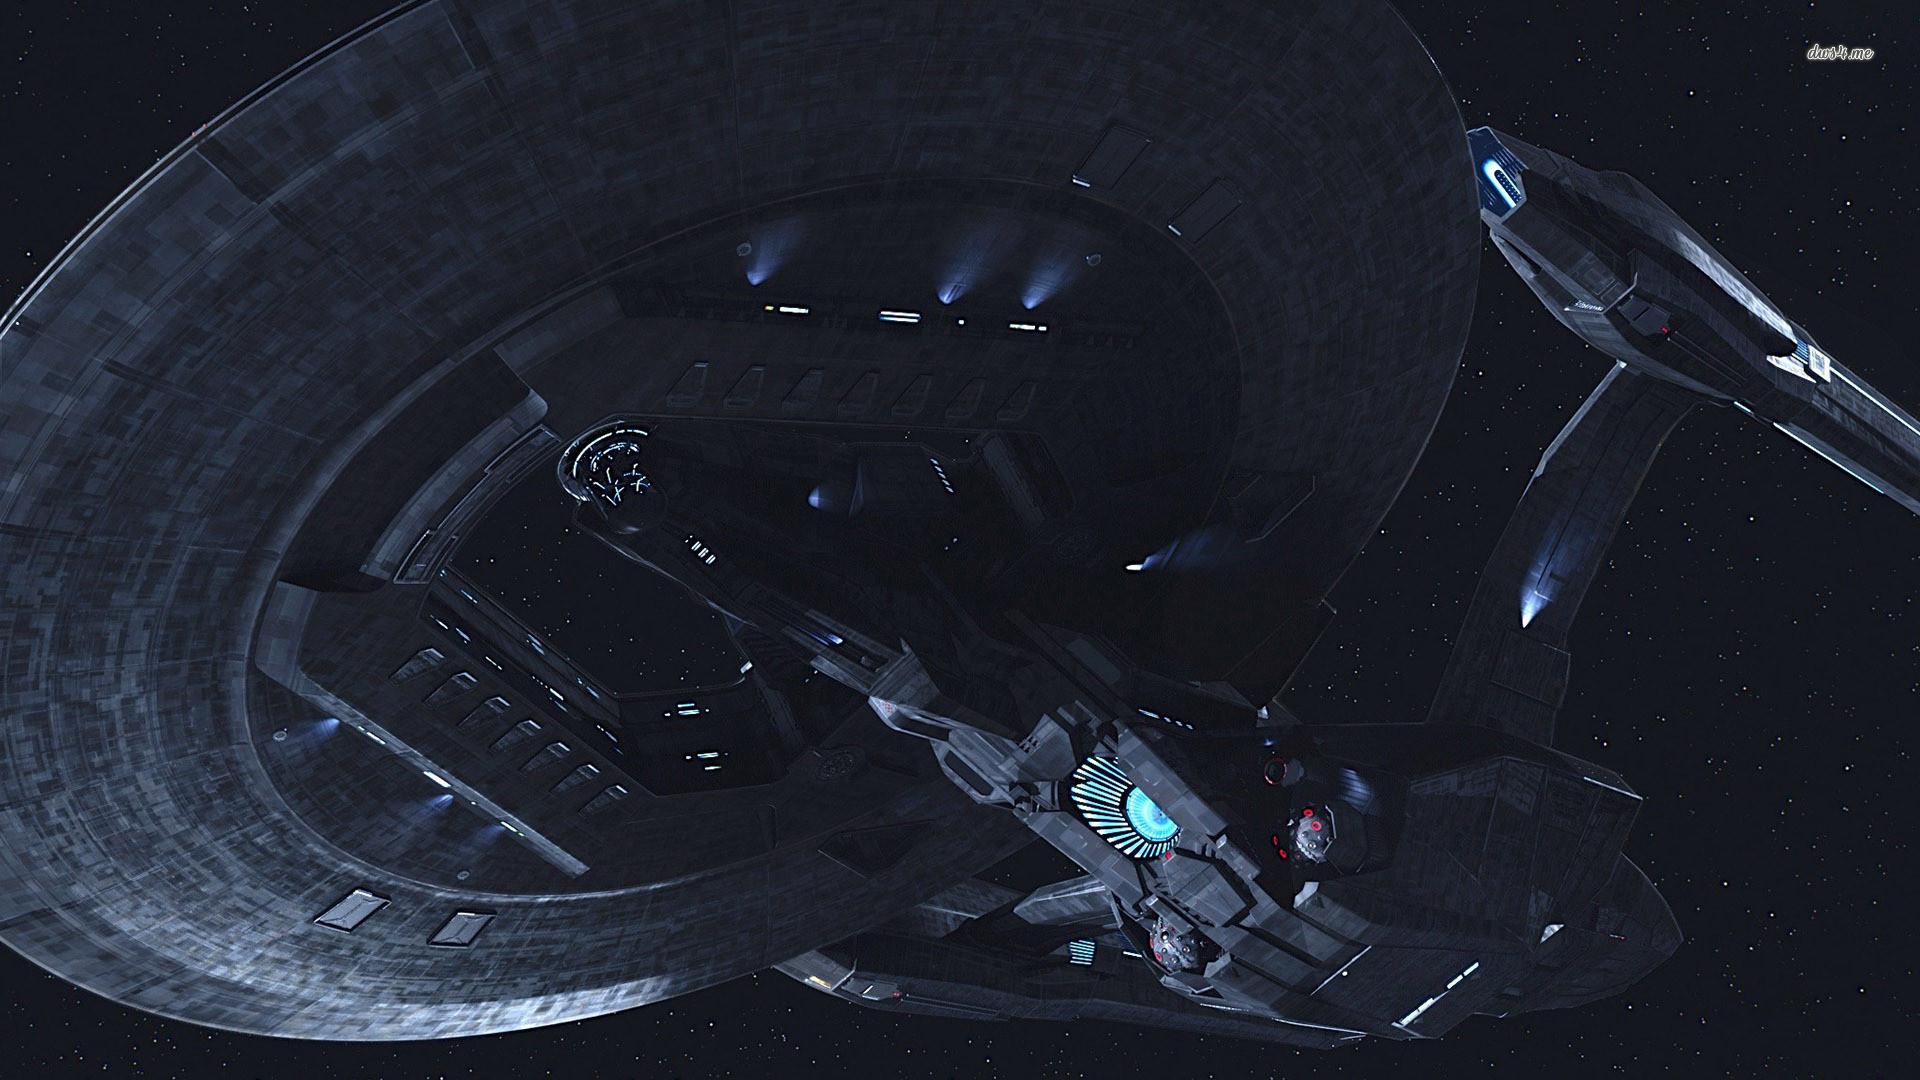 Uss vengeance Star trek Star trek into darkness HD Wallpapers